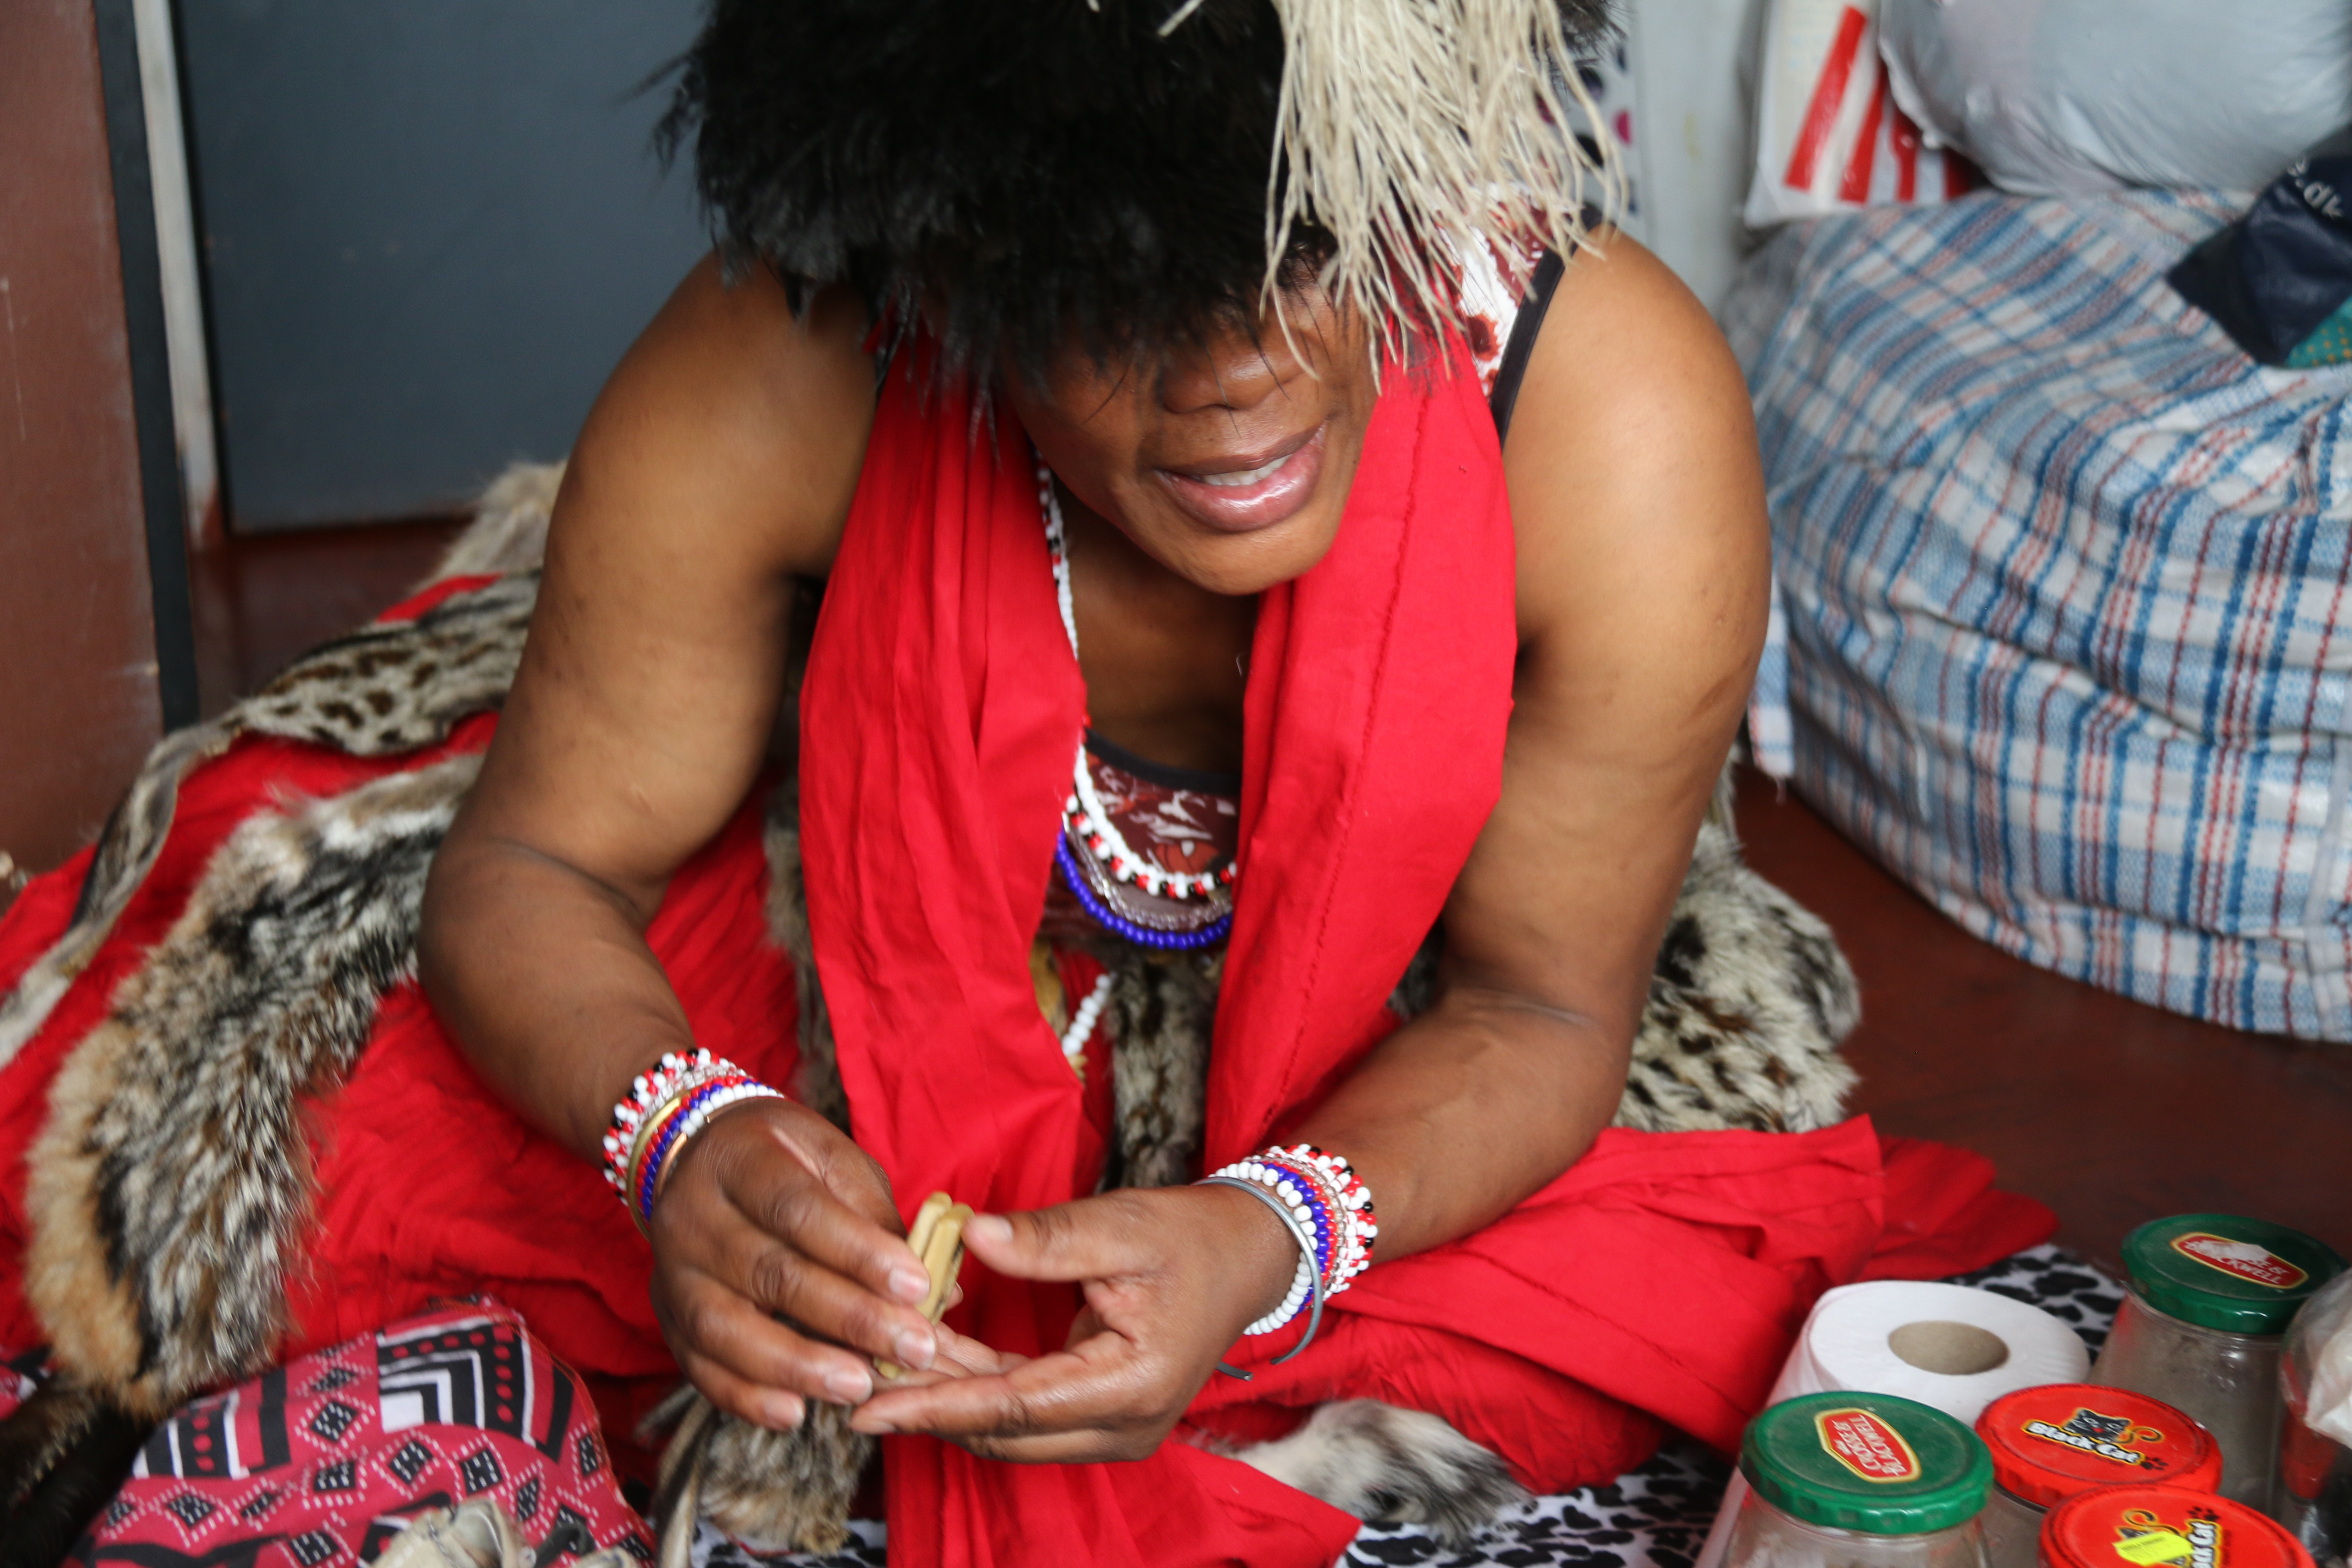 Vumani bo! Seers and sangomas in the city of gold | Joburg CBD